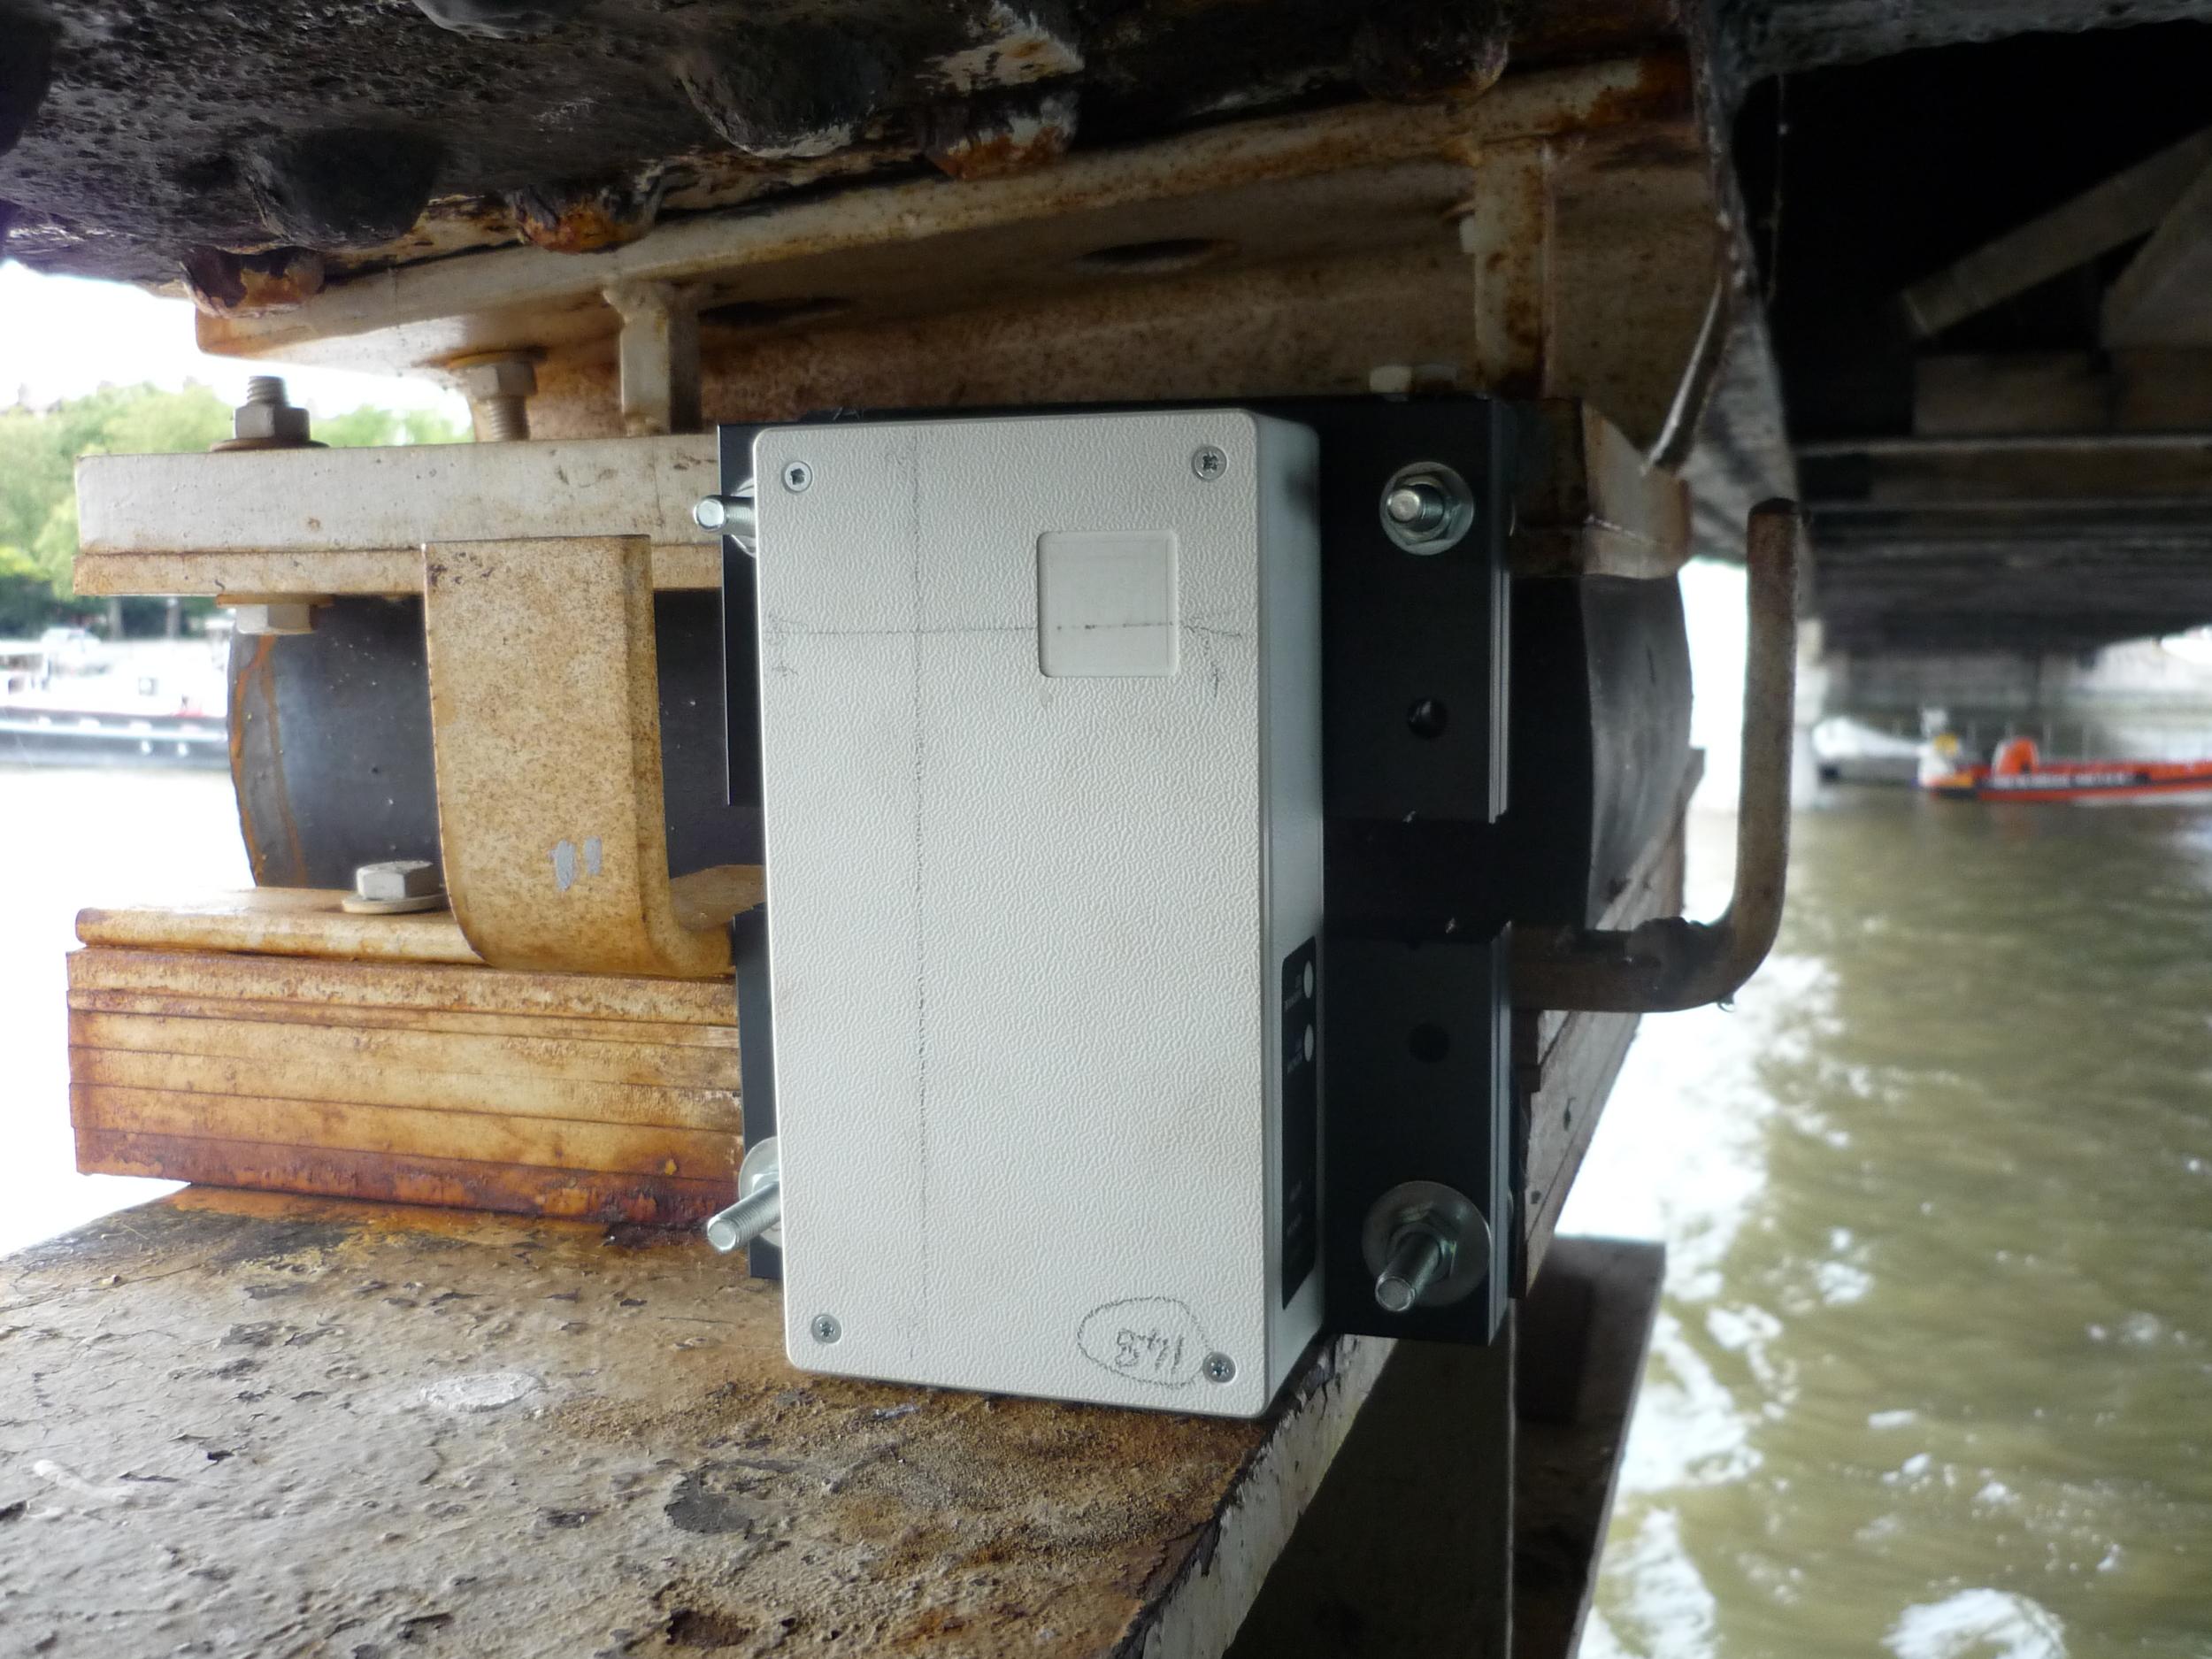 Bridge Joint Monitoring